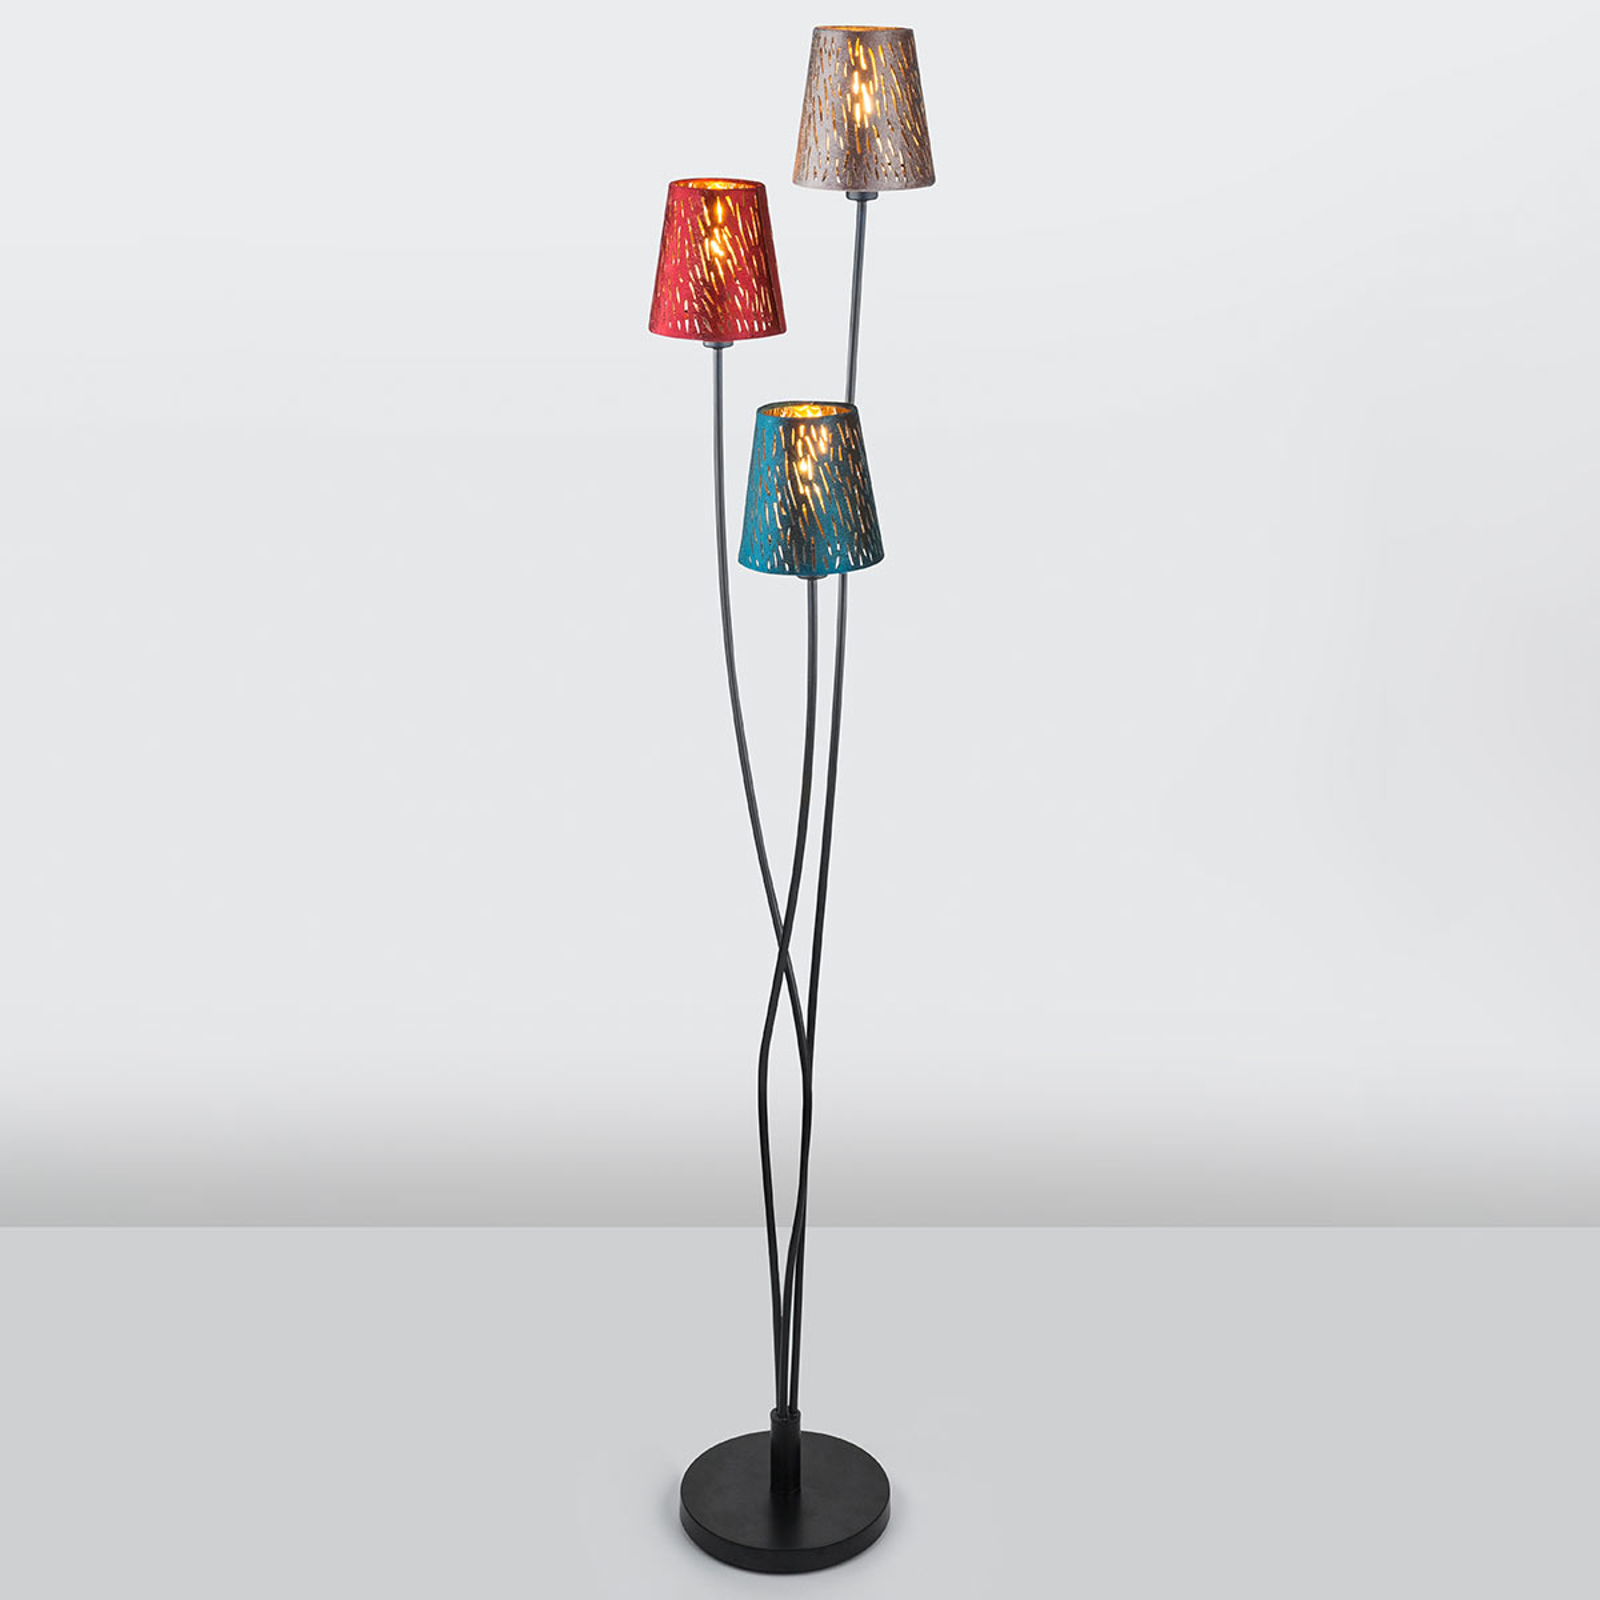 Ticon - gulvlampe med stofbetrukne skærme